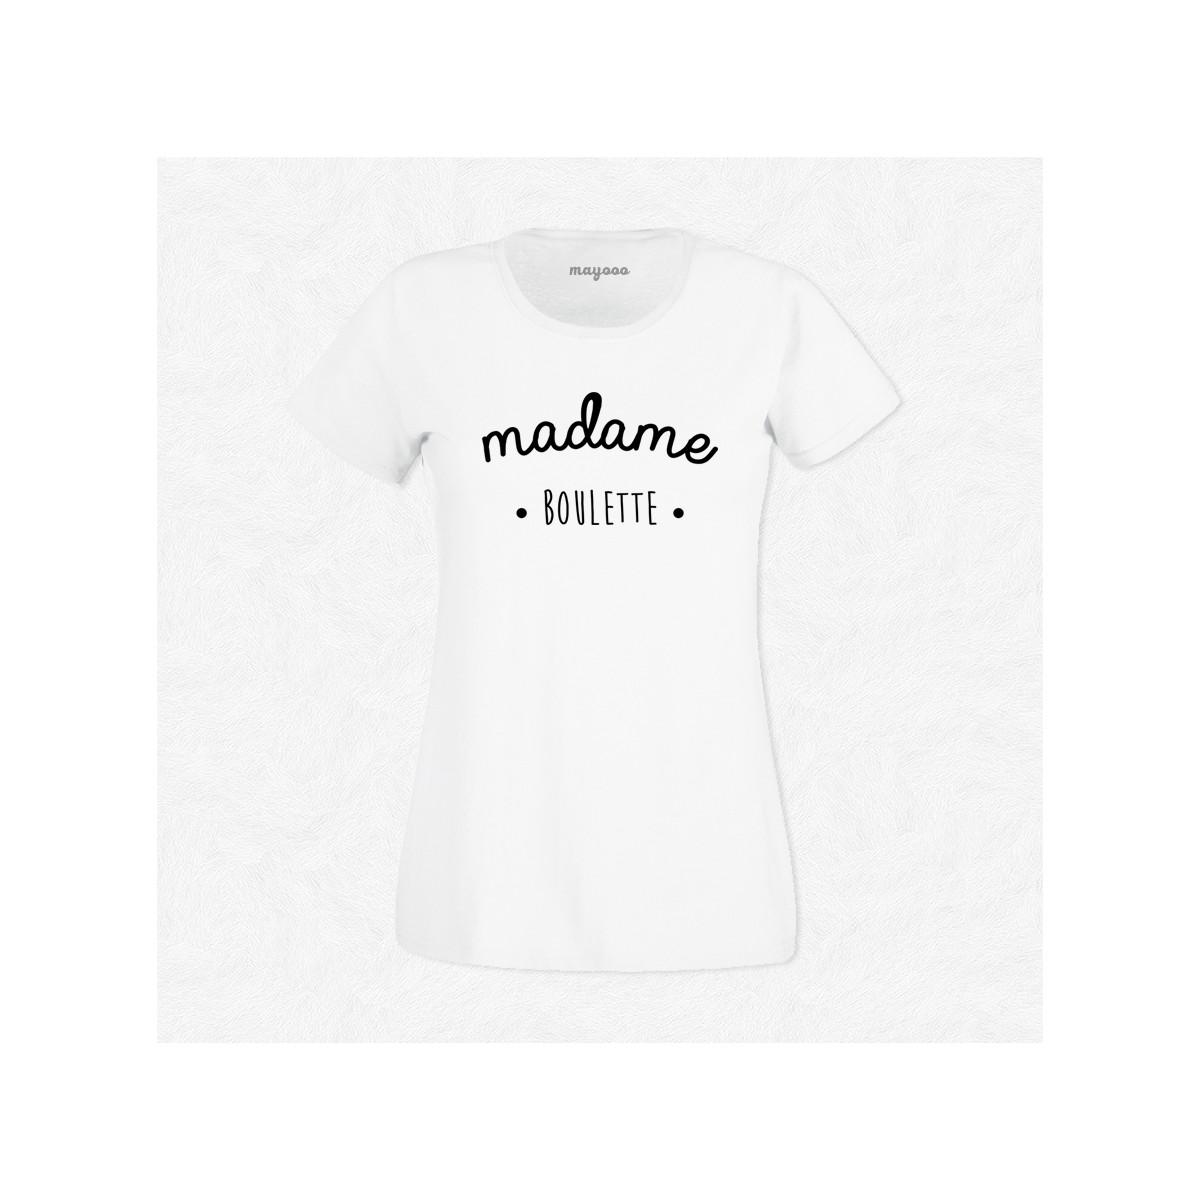 T-shirt Madame boulette